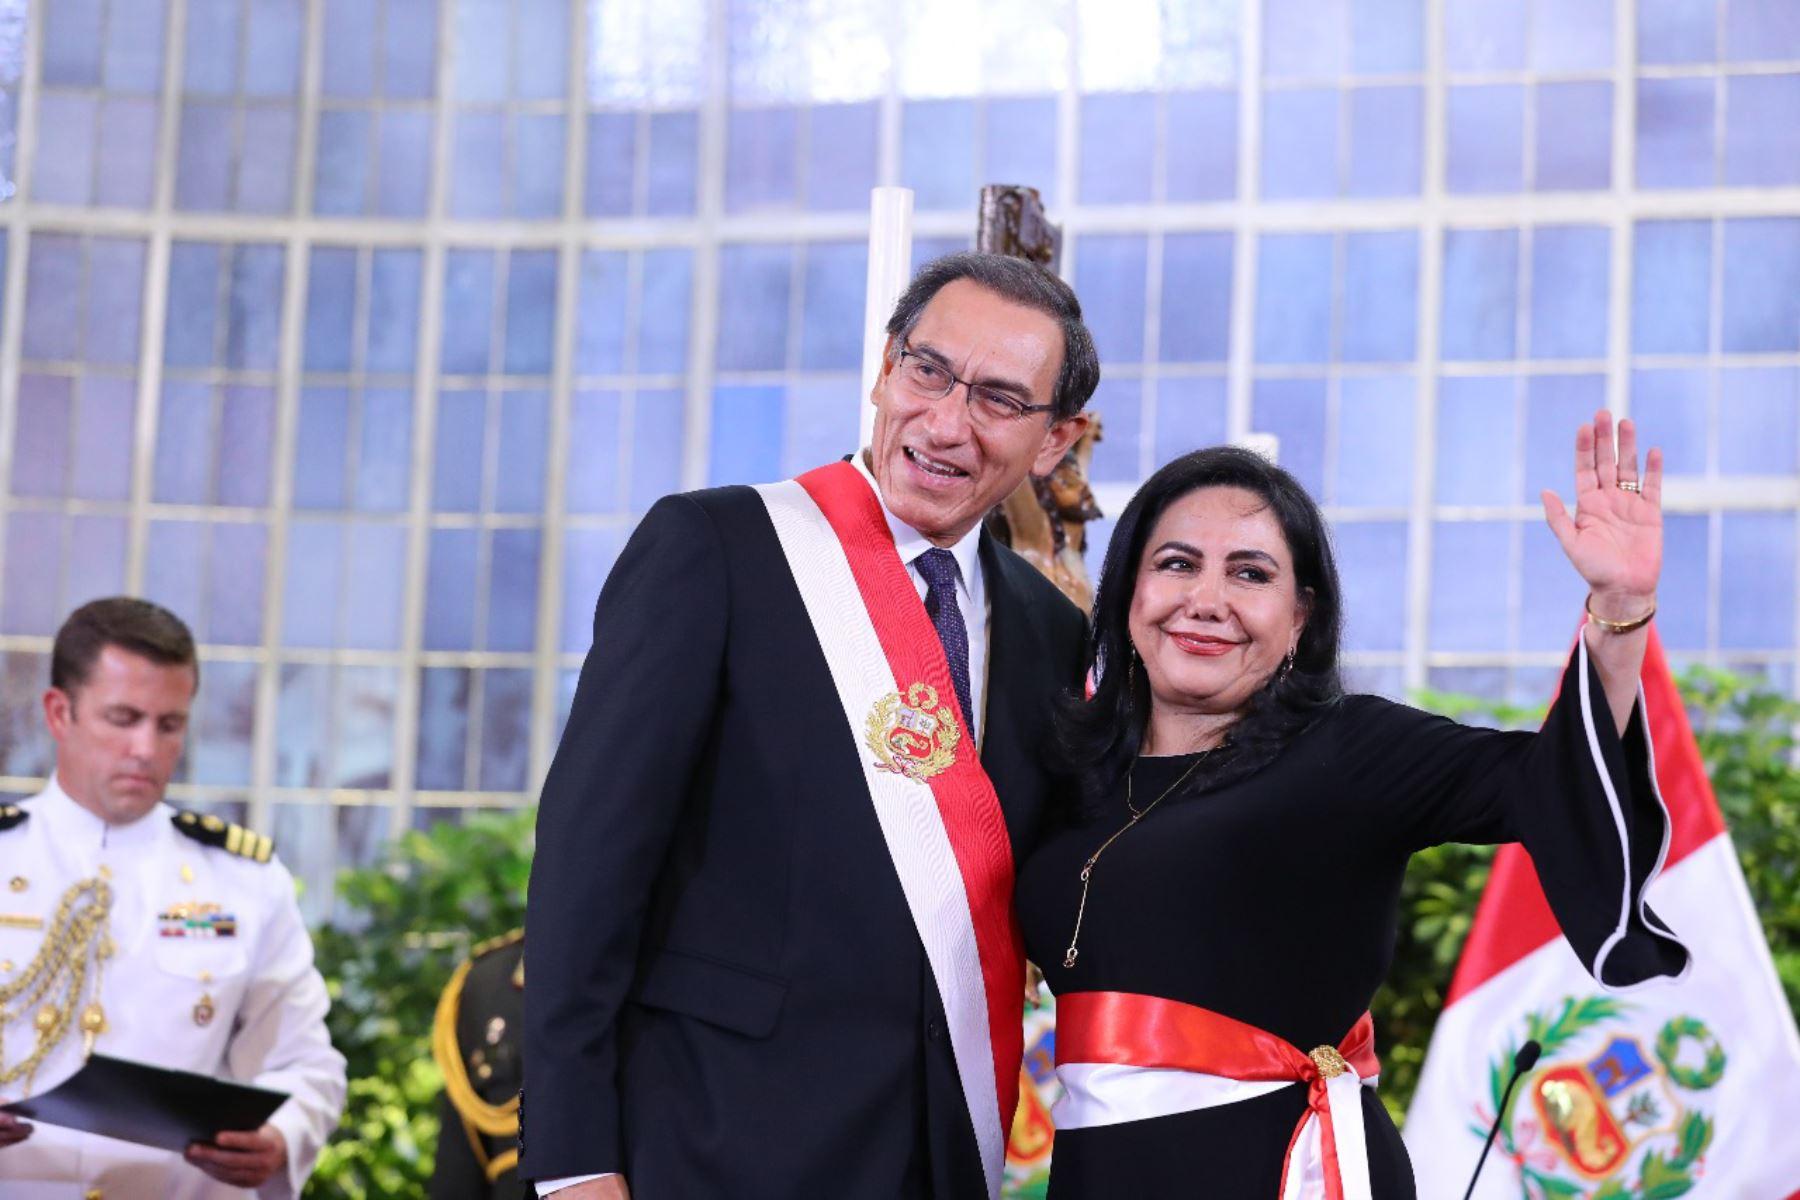 Gloria Montenegro juramenta como ministra de La Mujer. Foto: ANDINA/Prensa Presidencia